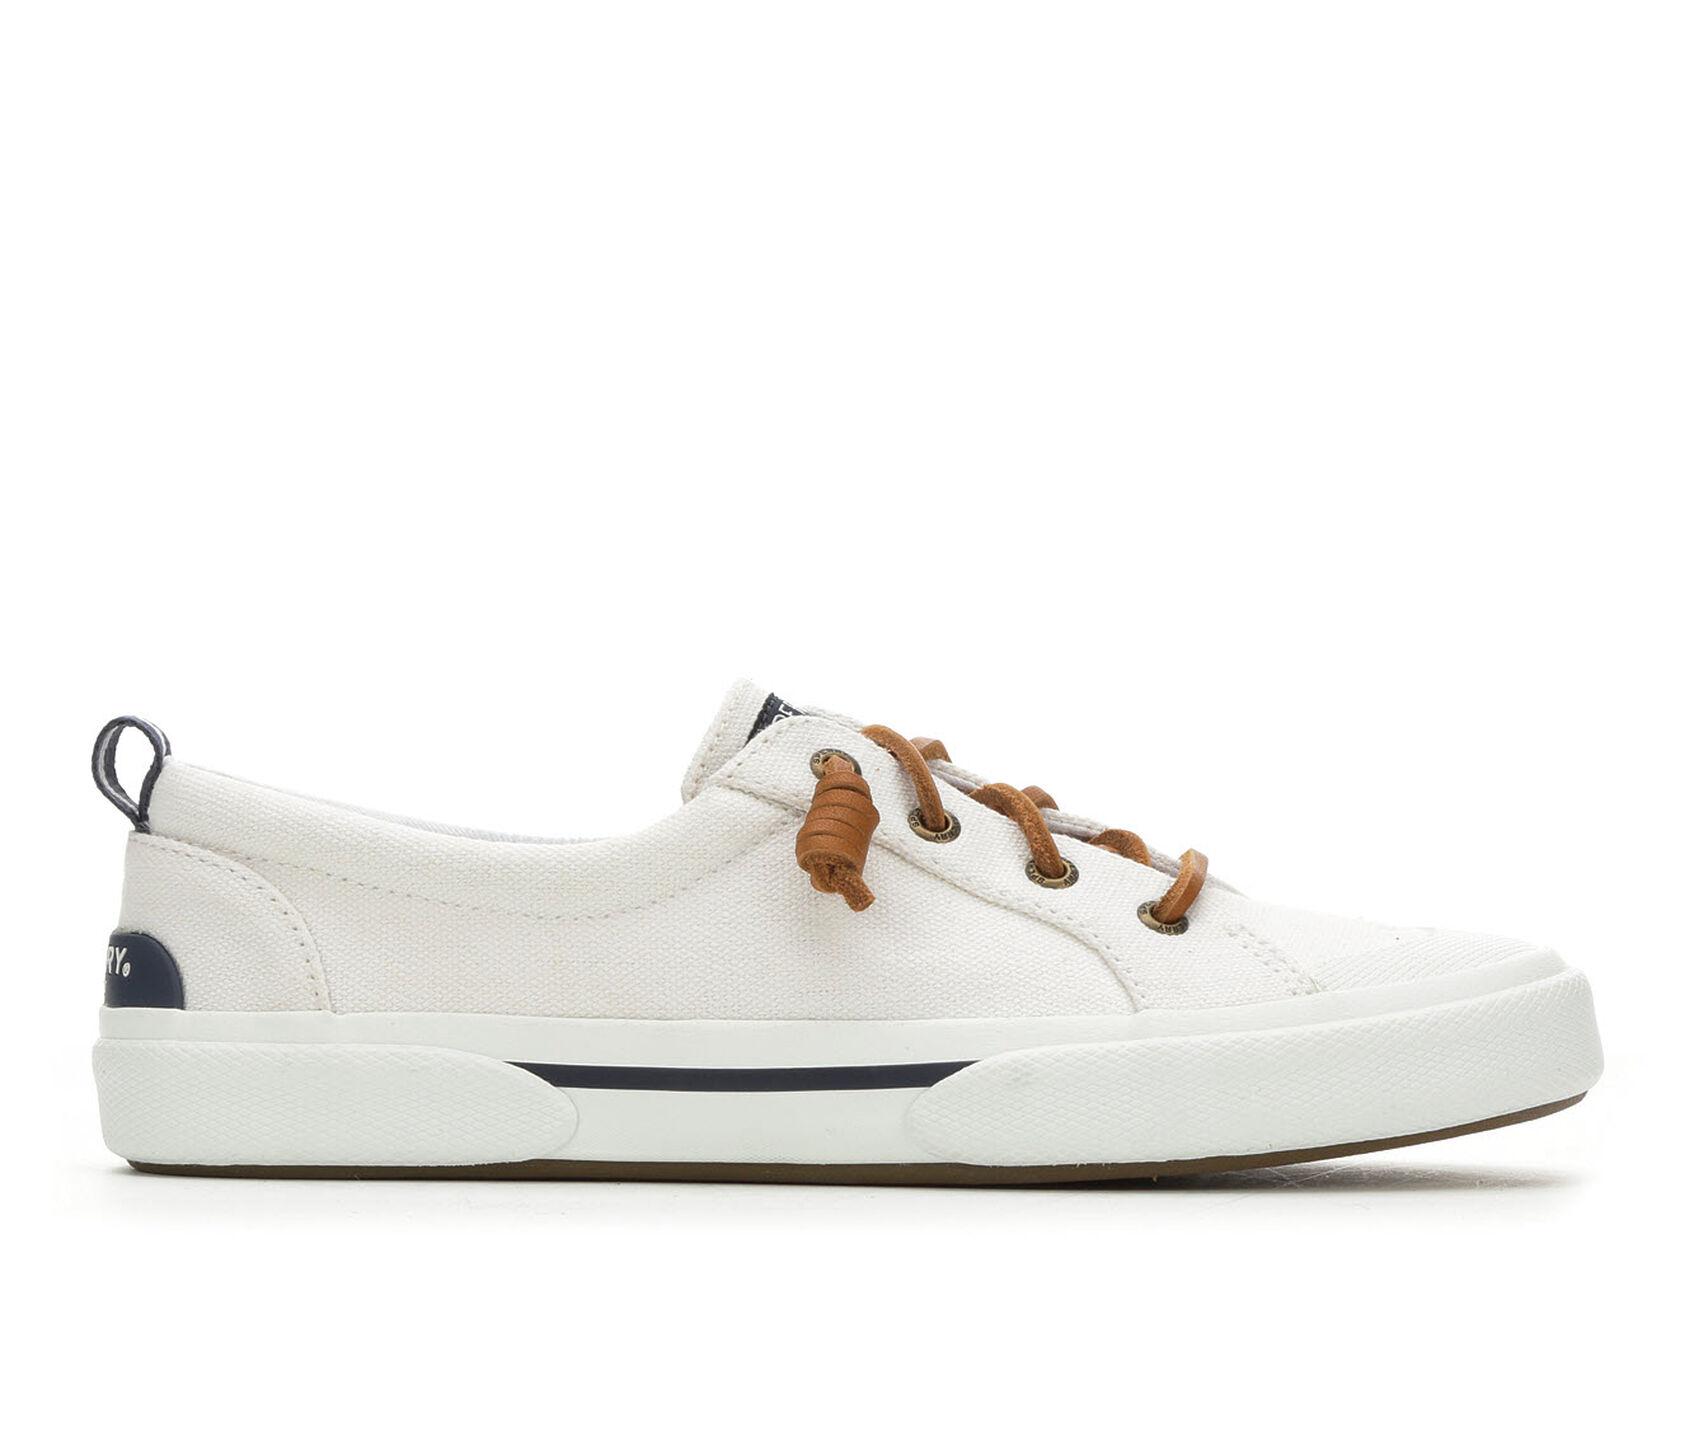 b6e606e61e Women s Sperry Wave Lace to Toe Sneakers